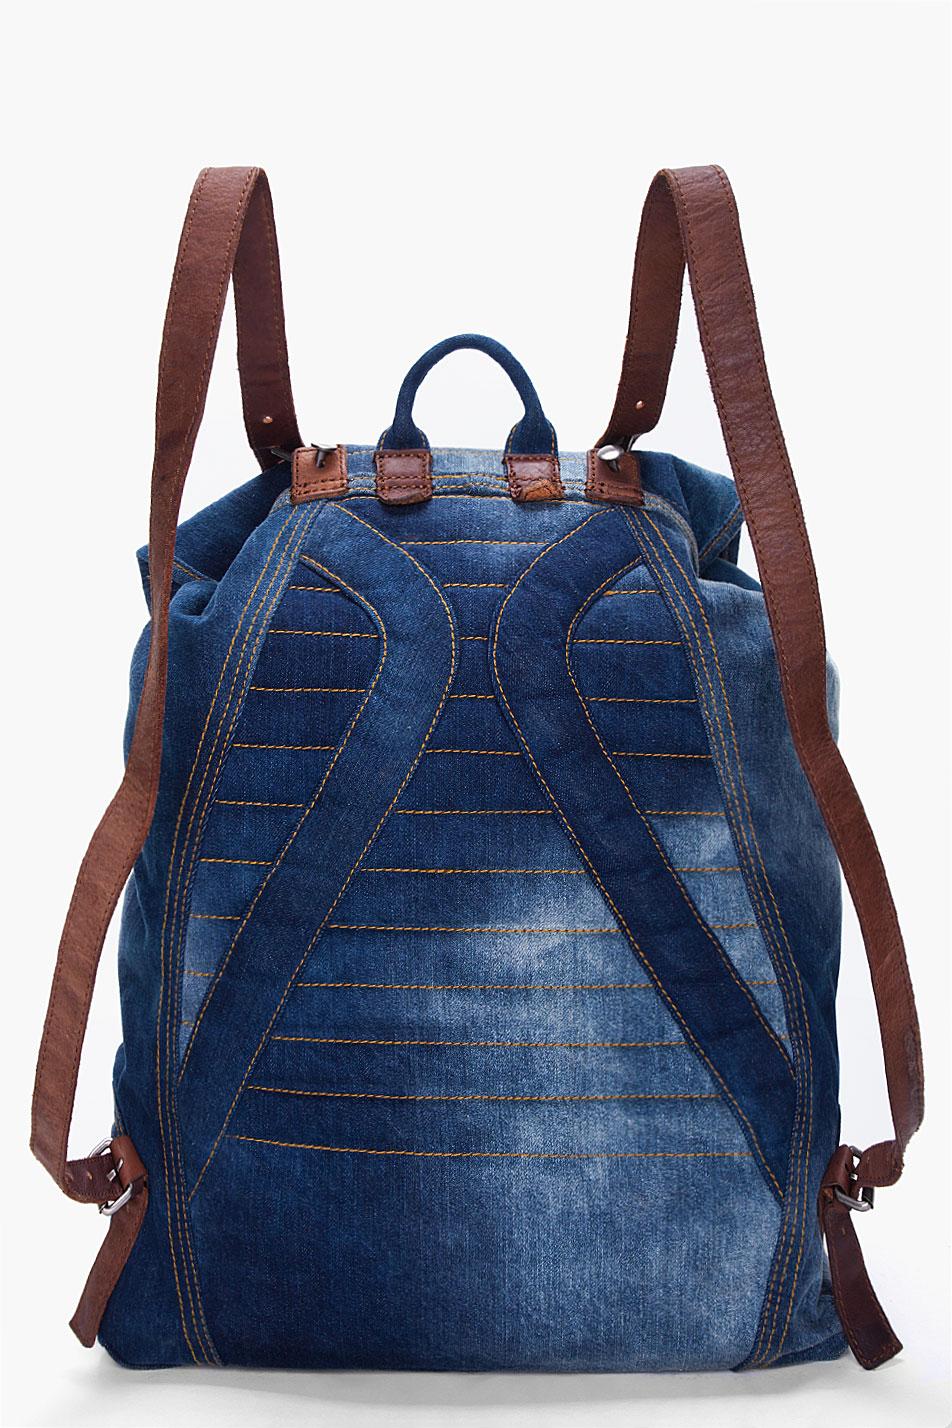 Diesel Indigo Denim Backpack In Blue For Men Lyst